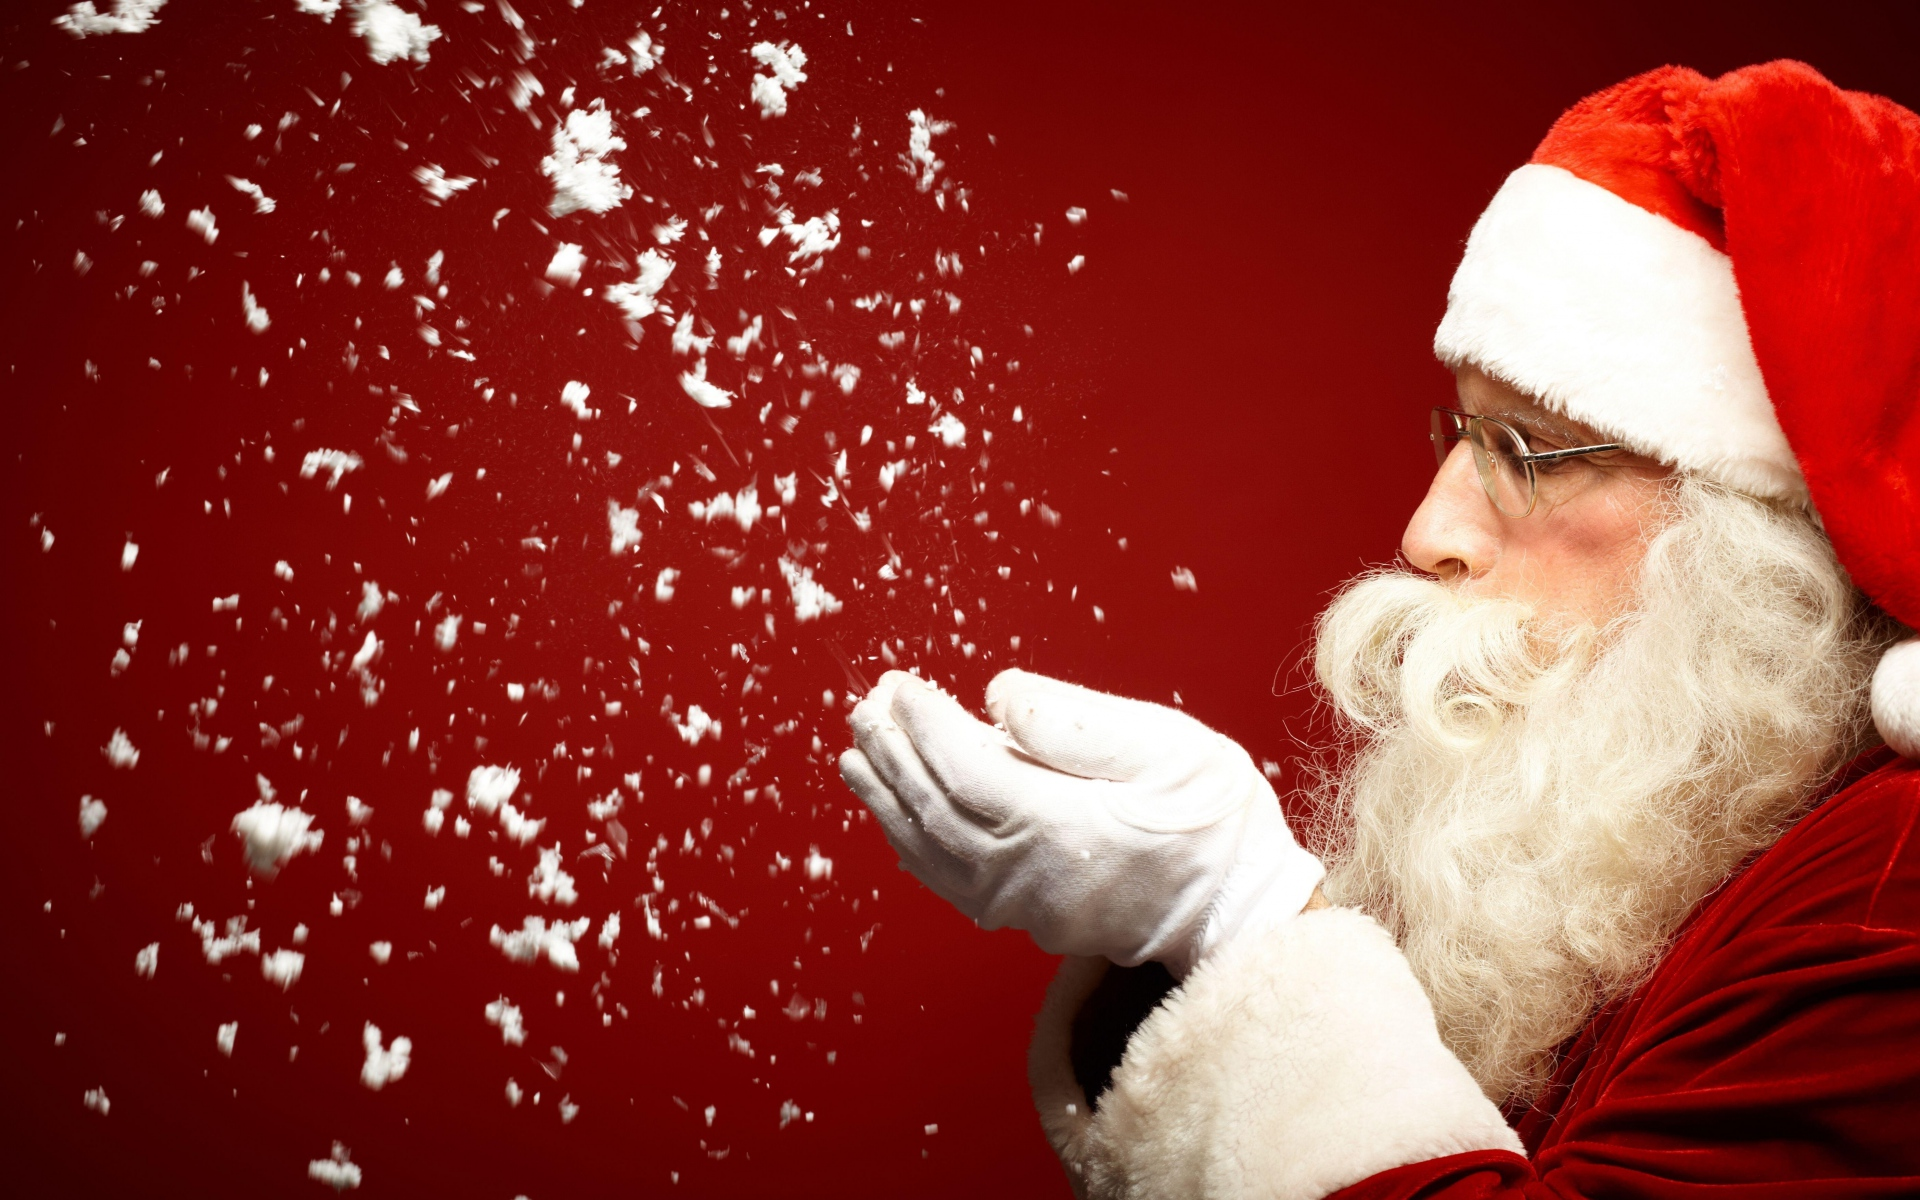 christmas santa claus image